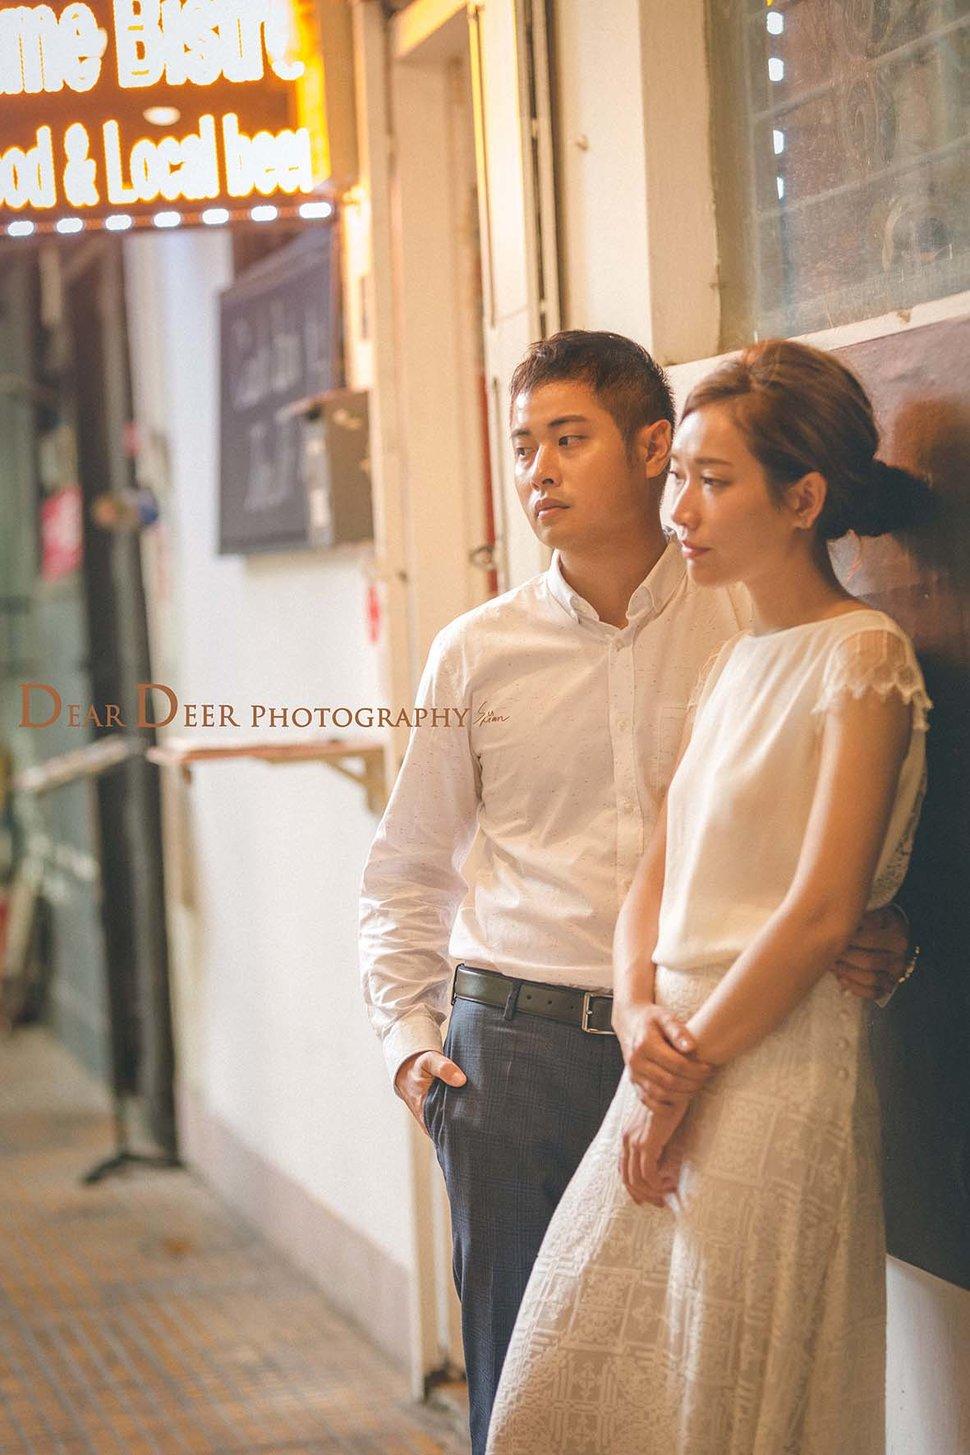 Dear Deer|電影劇照風格(編號:2843683) - Dear Deer鹿兒攝影|女攝影師蘇蔓 - 結婚吧